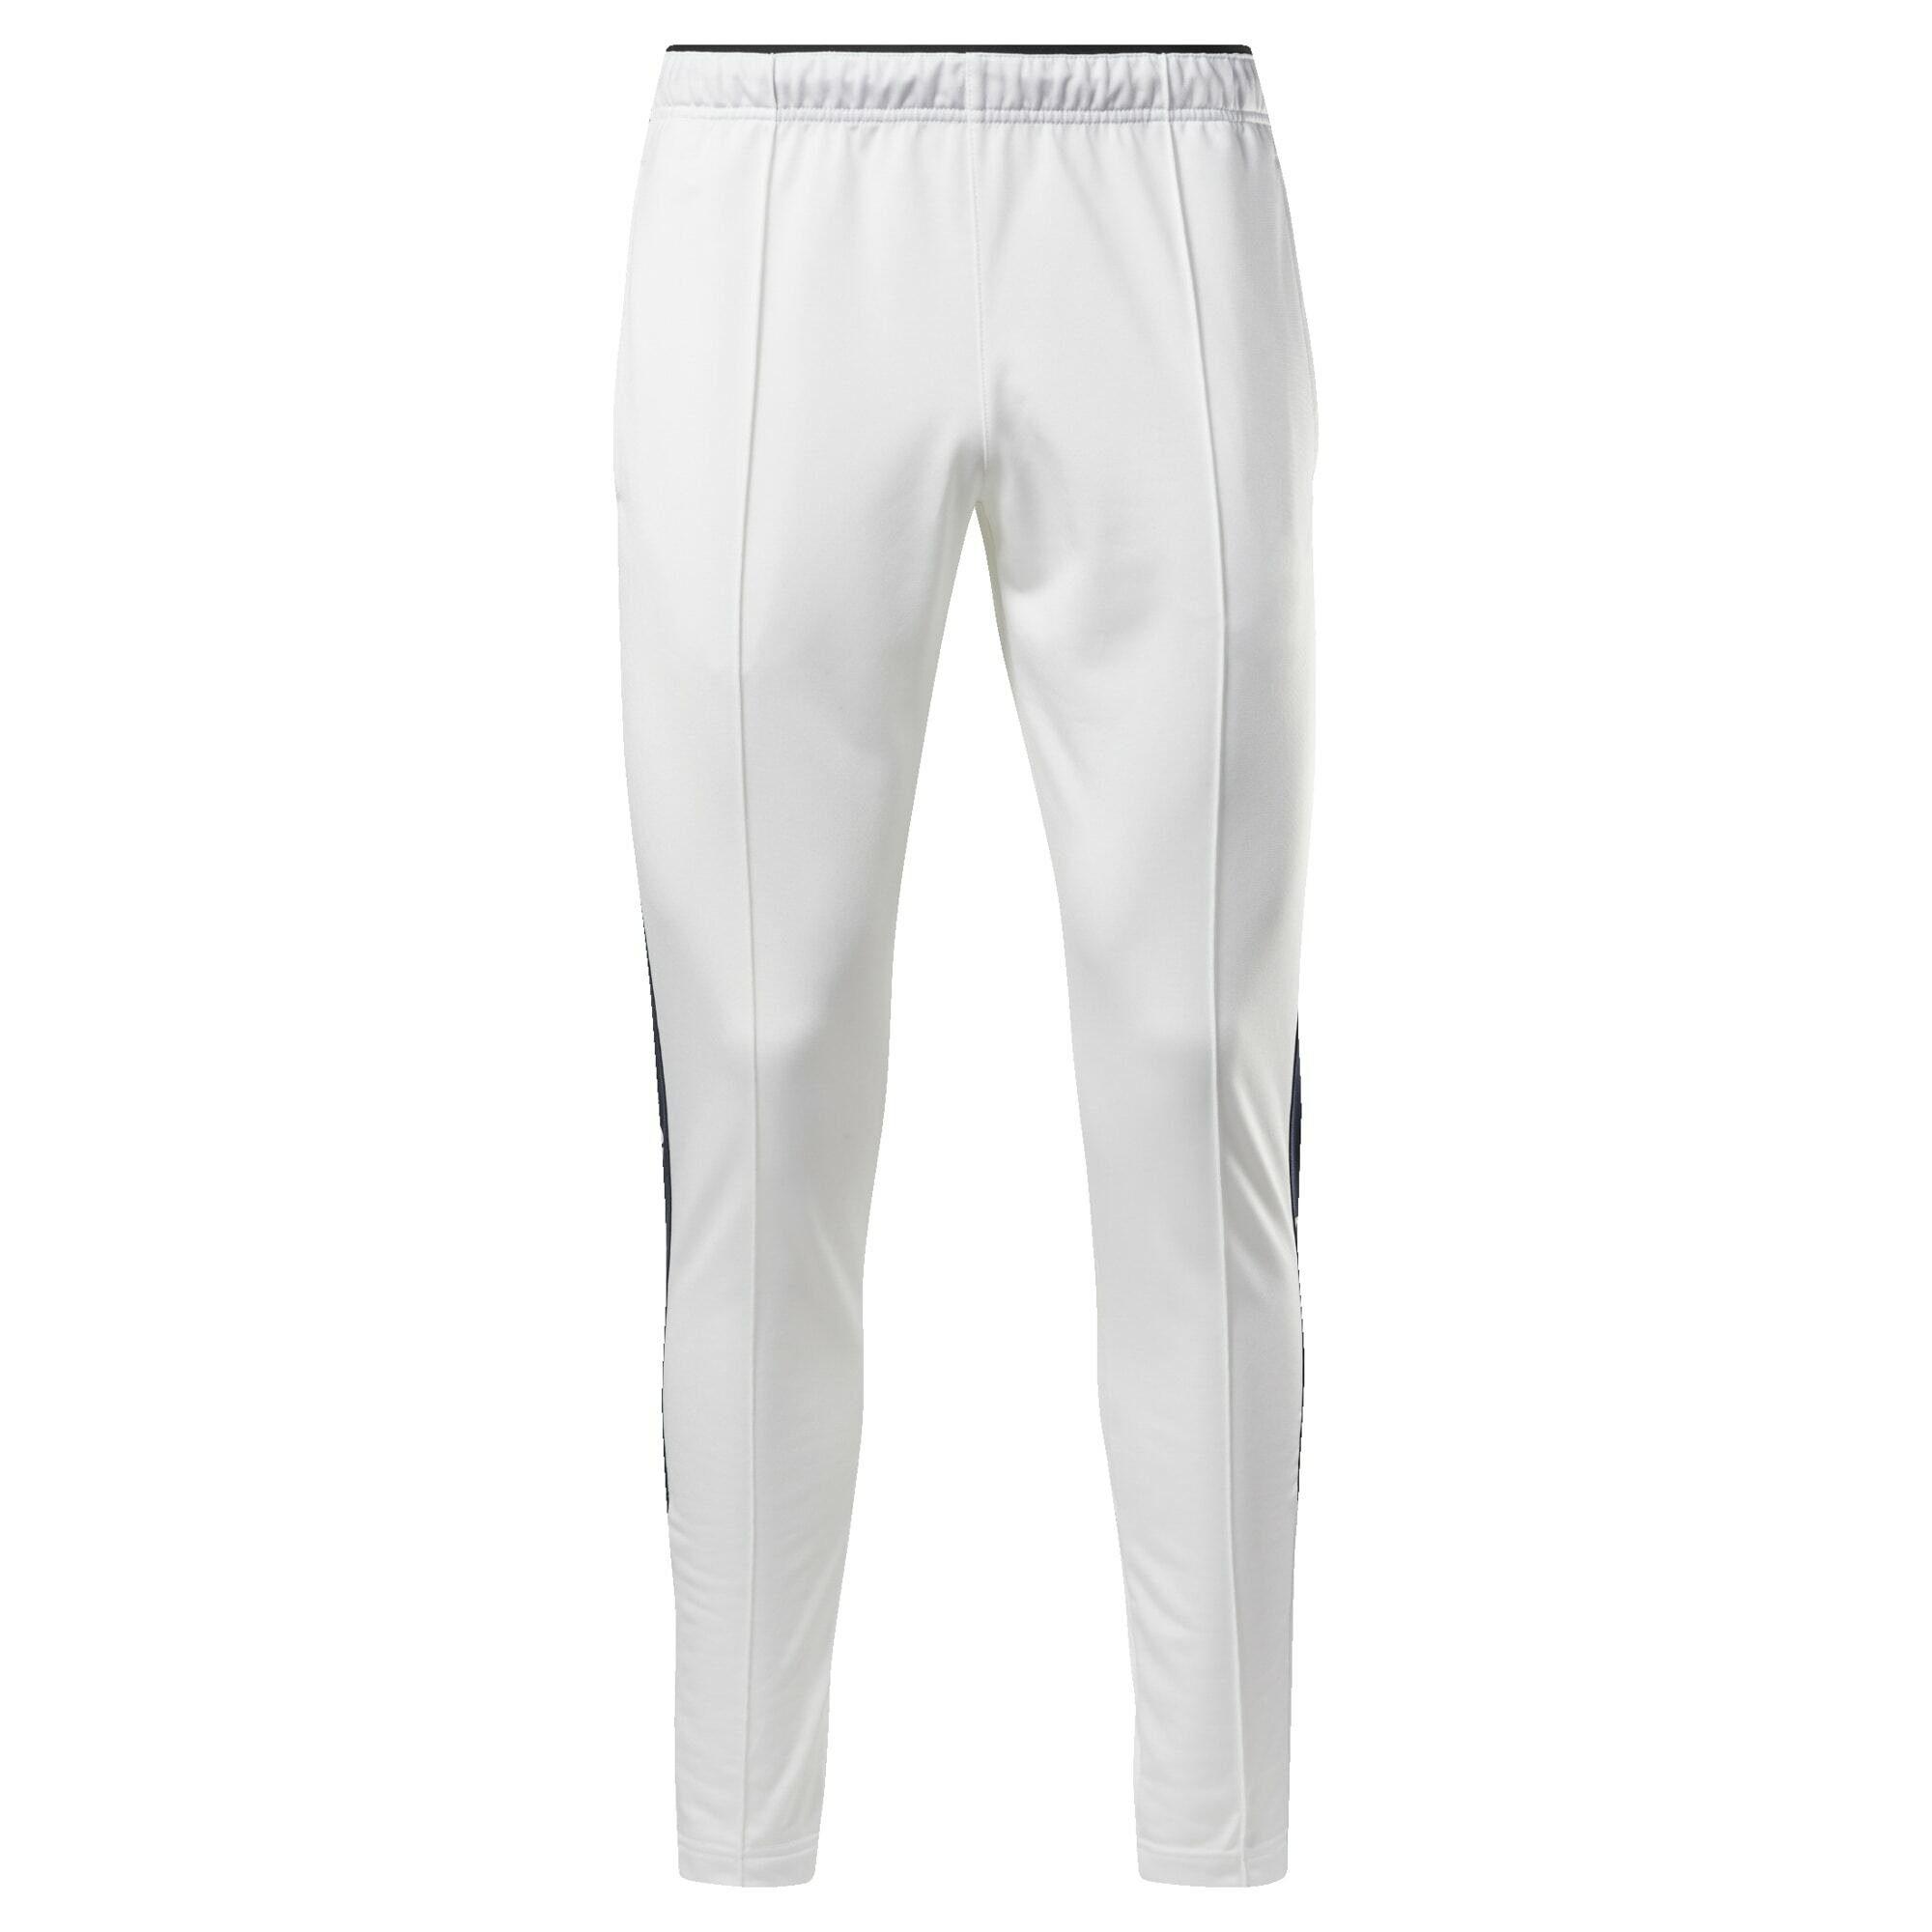 NIKE PANTS HOSE Sportswear Tribute Joggers Stretch Knöchel